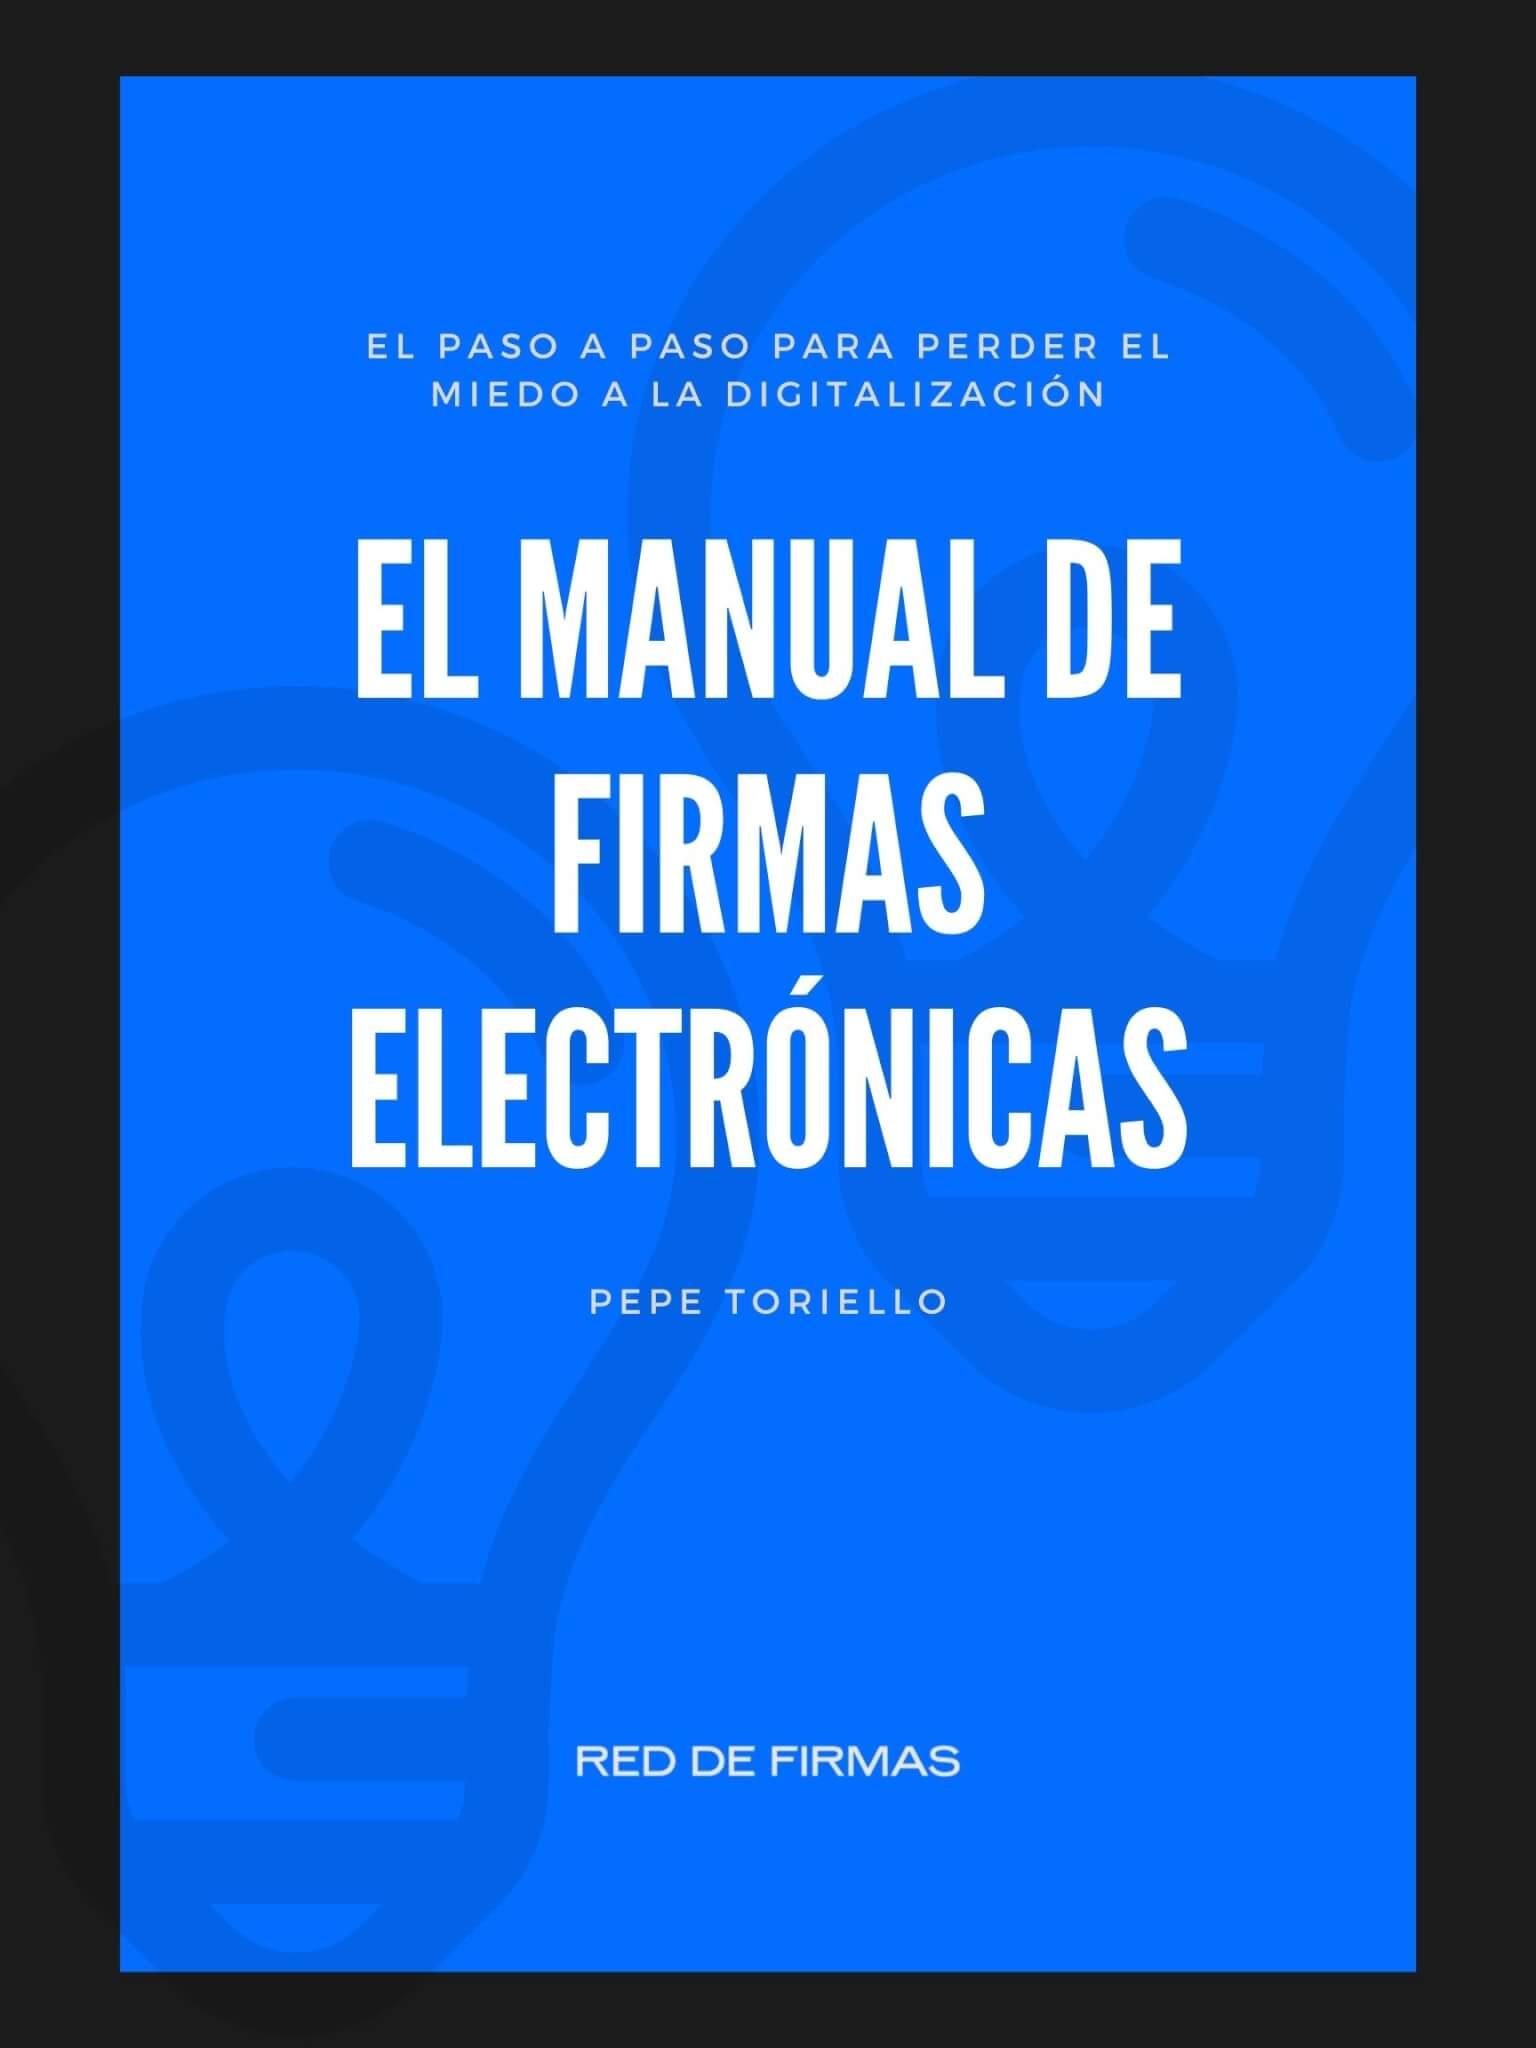 manual de firmas electrónicas